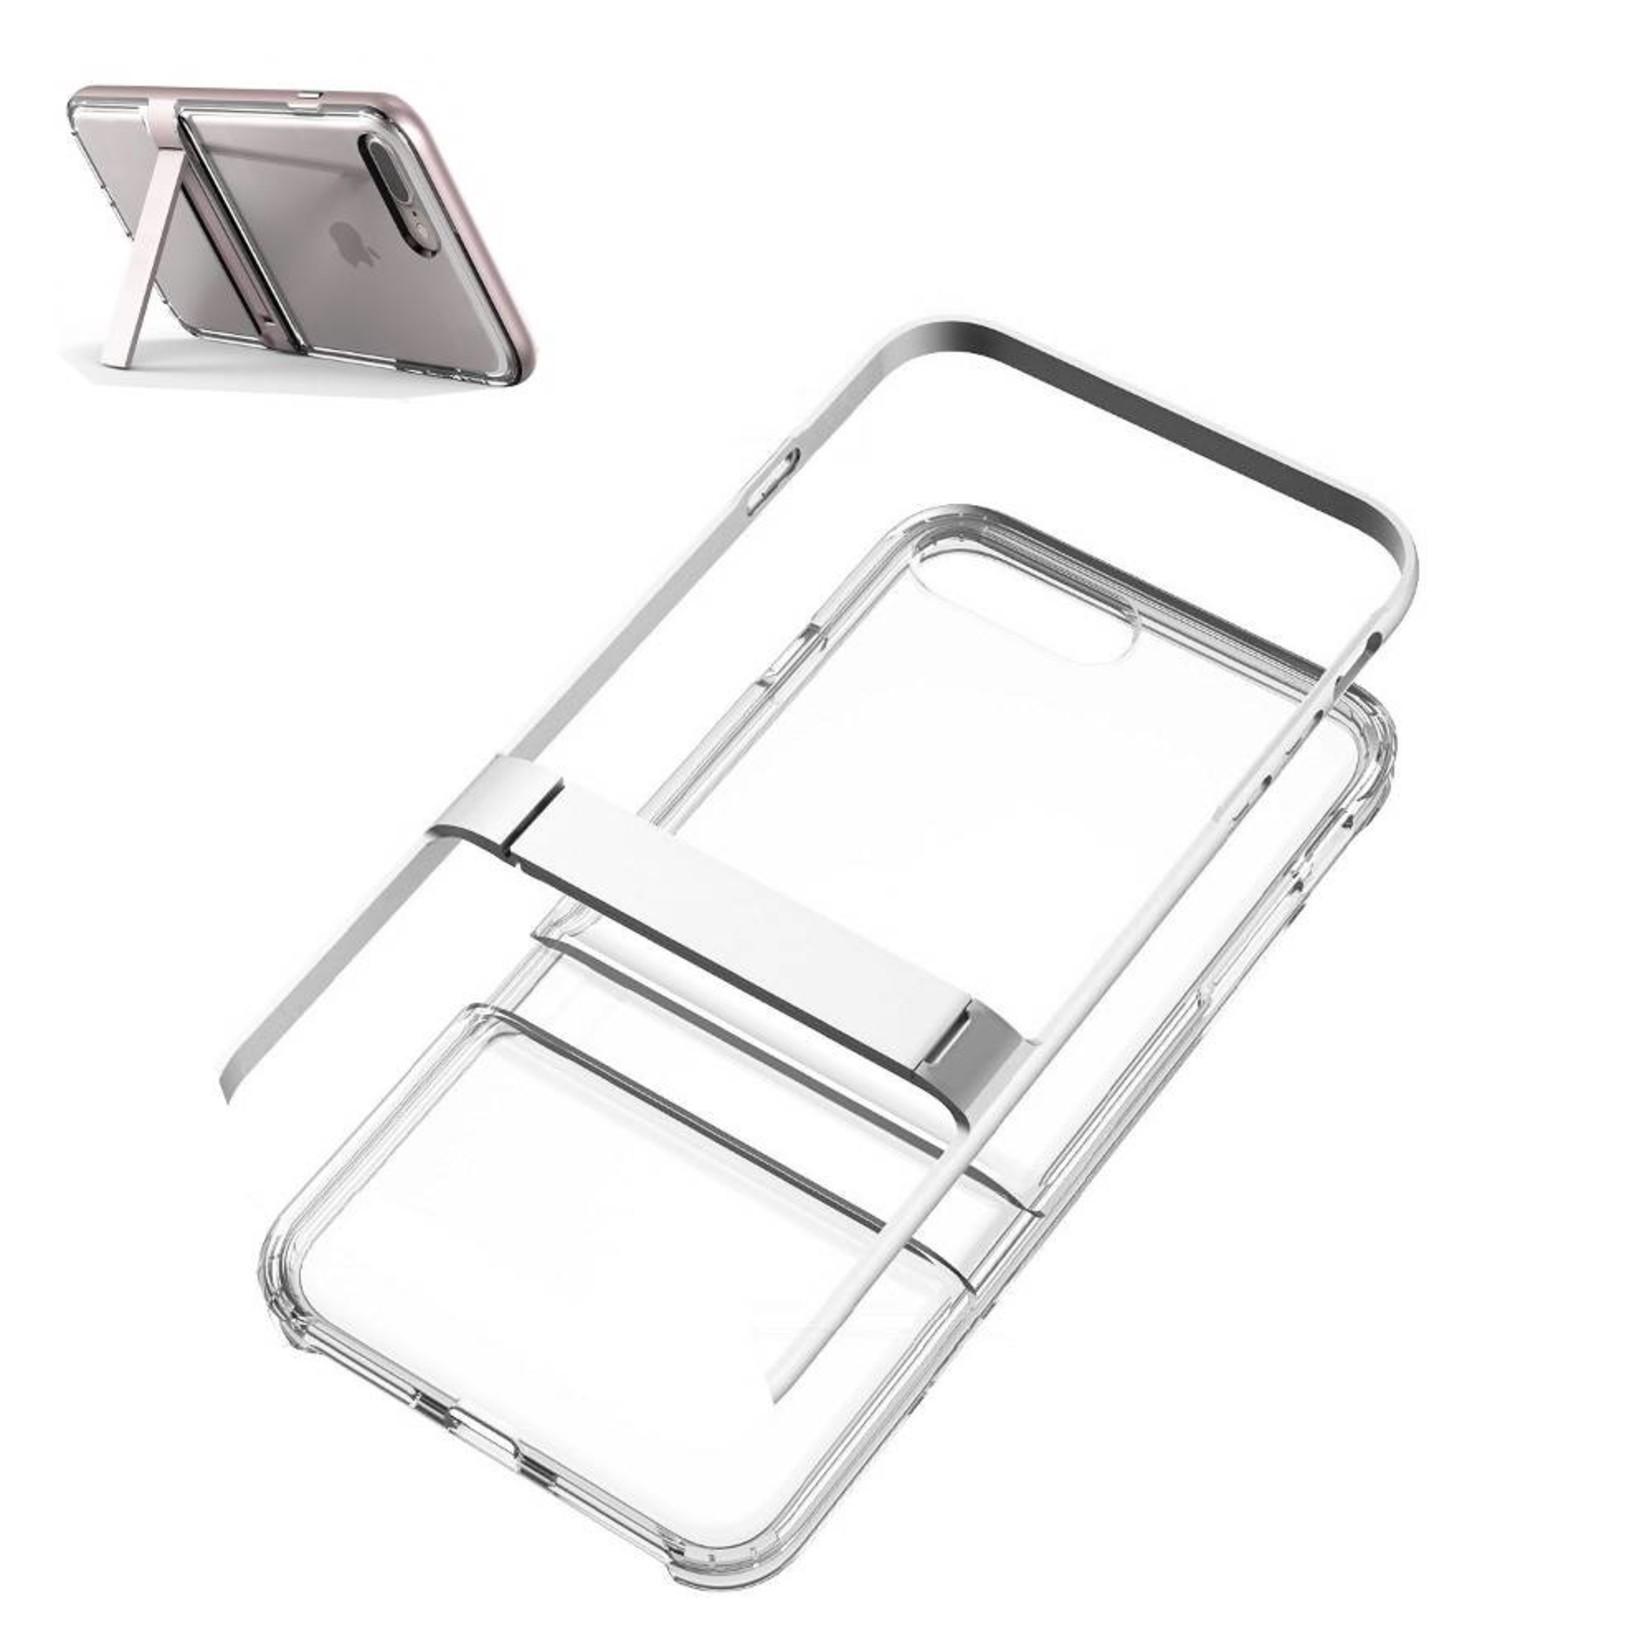 Colorfone Hoesje CoolSkin 2-in-1 Apple iPhone 8 Plus/7 Plus Zilver